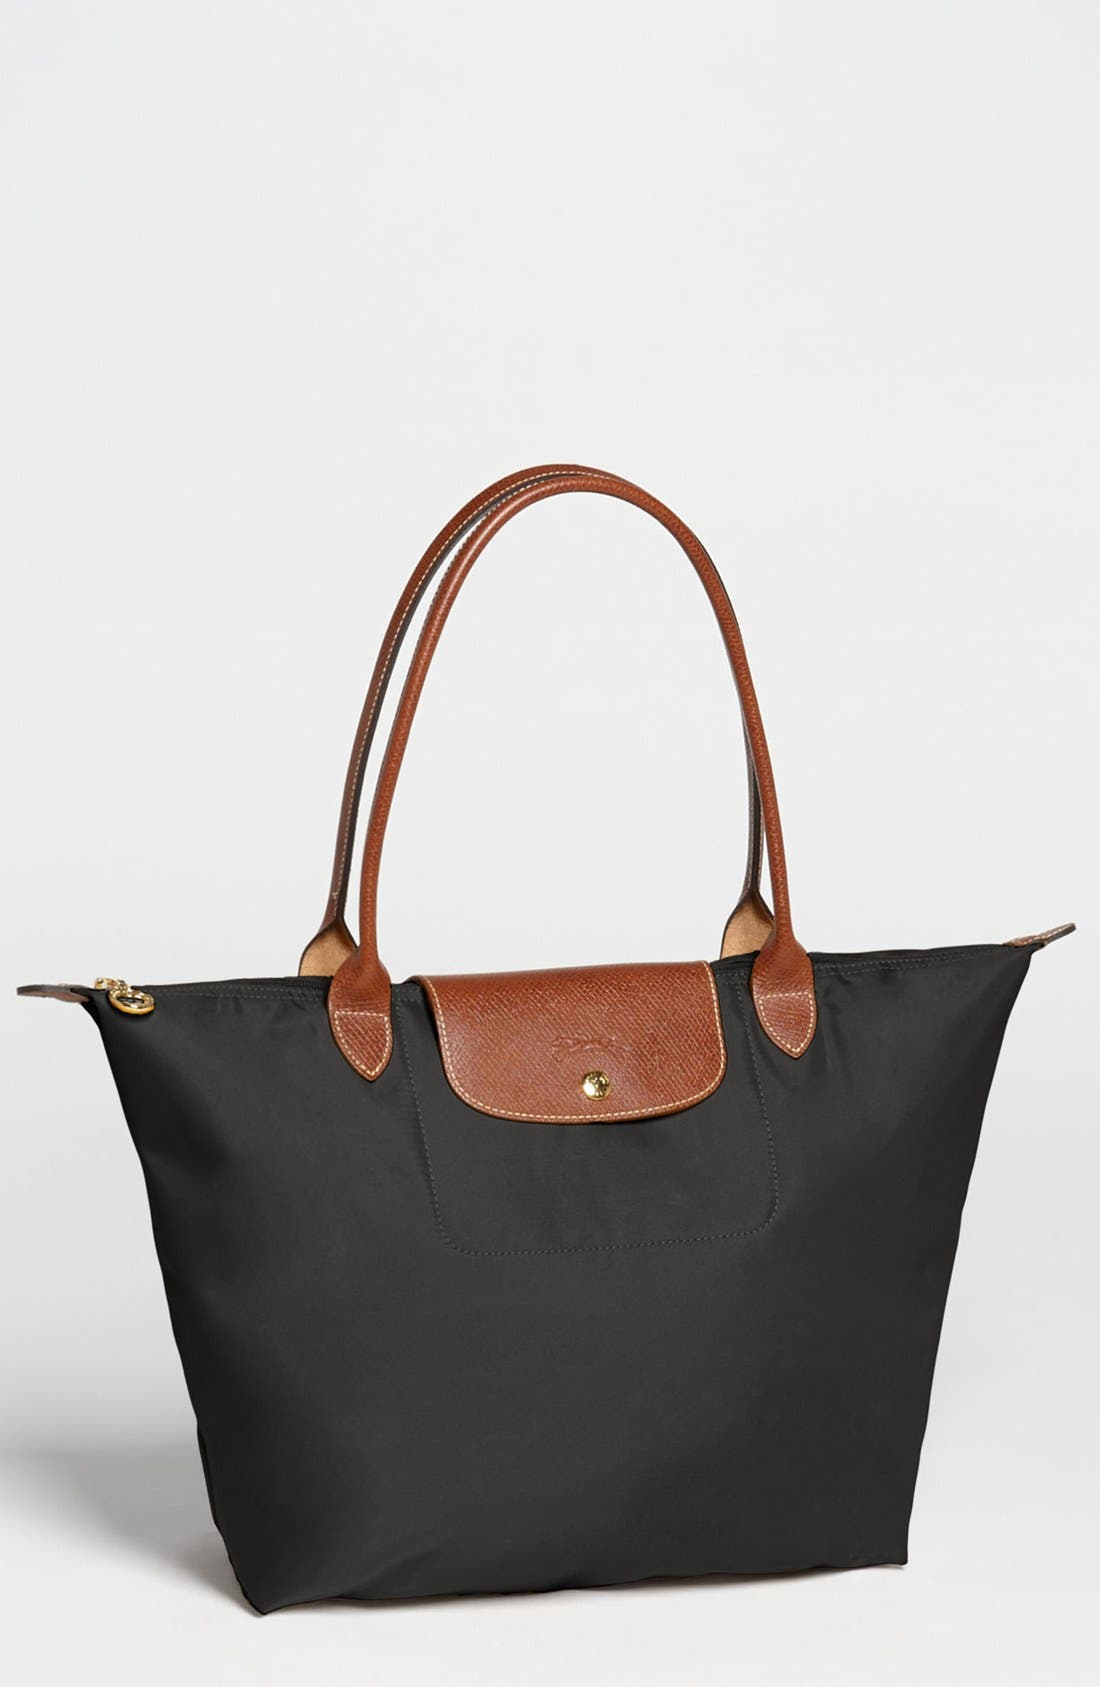 Main Image - Longchamp 'Large Le Pliage' Tote